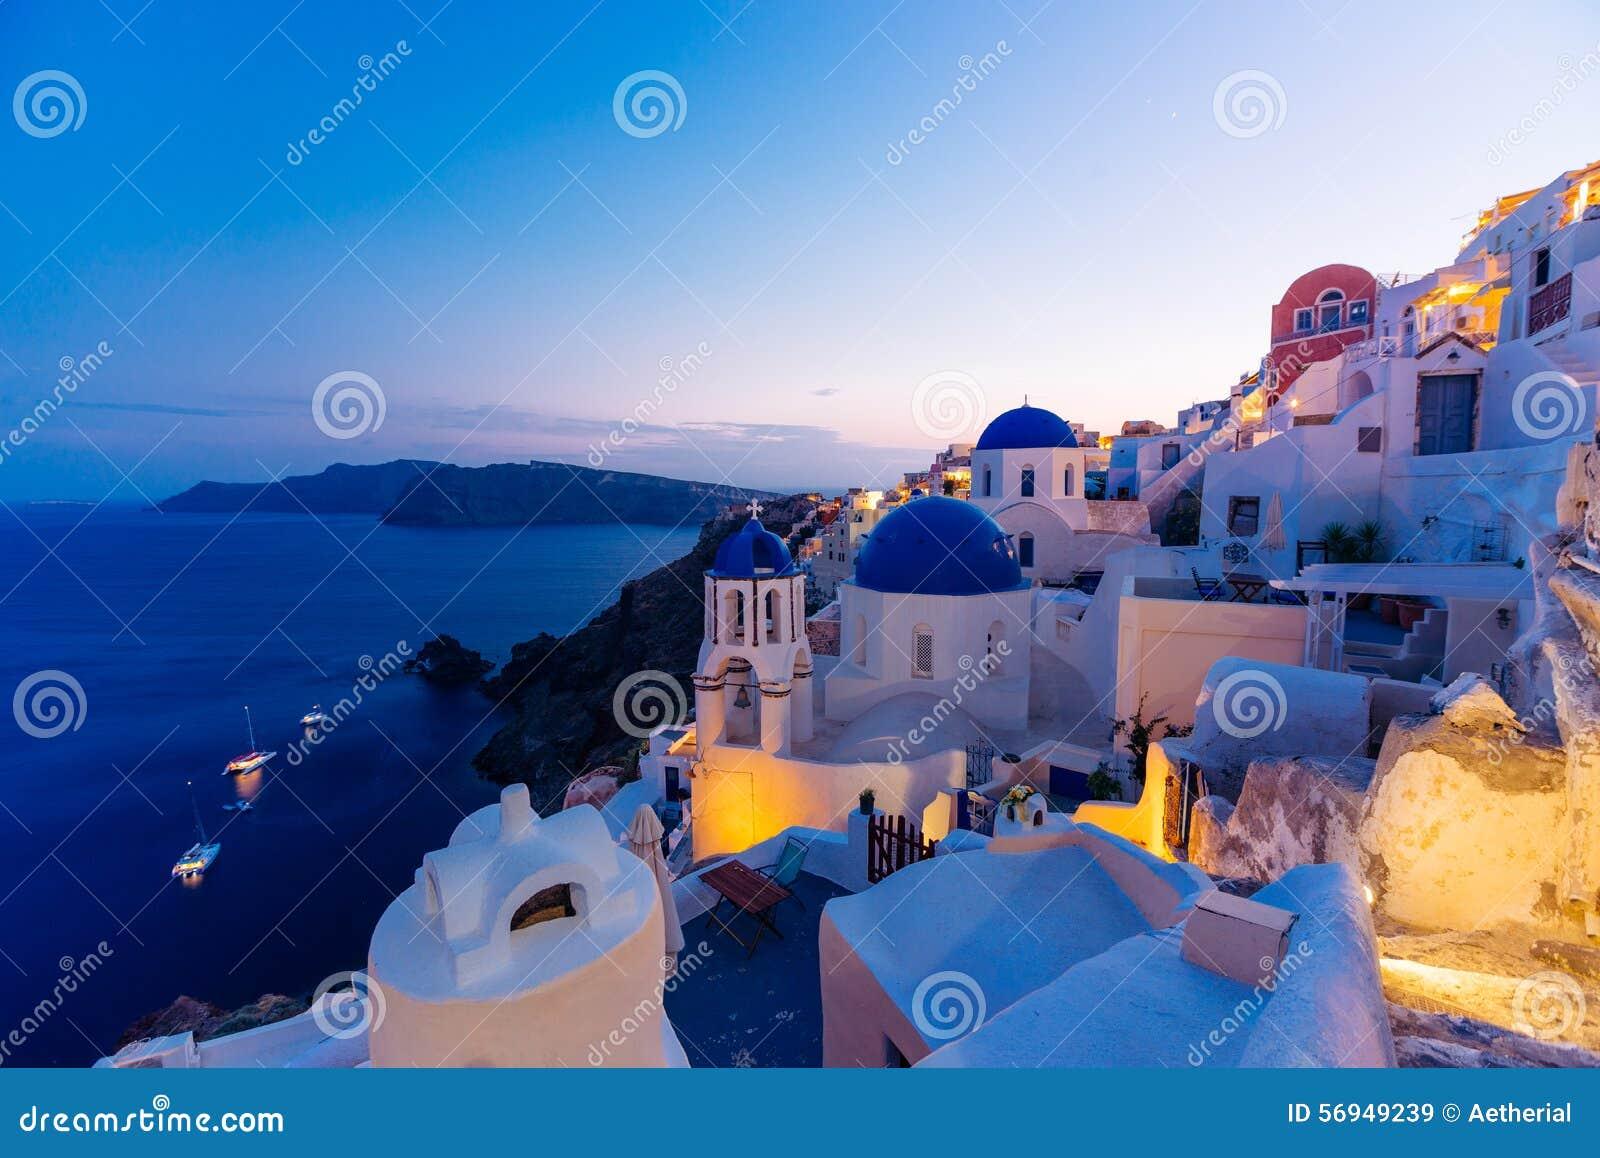 Famous Santorini blue dome churches at night, Oia, Santorini, Greece